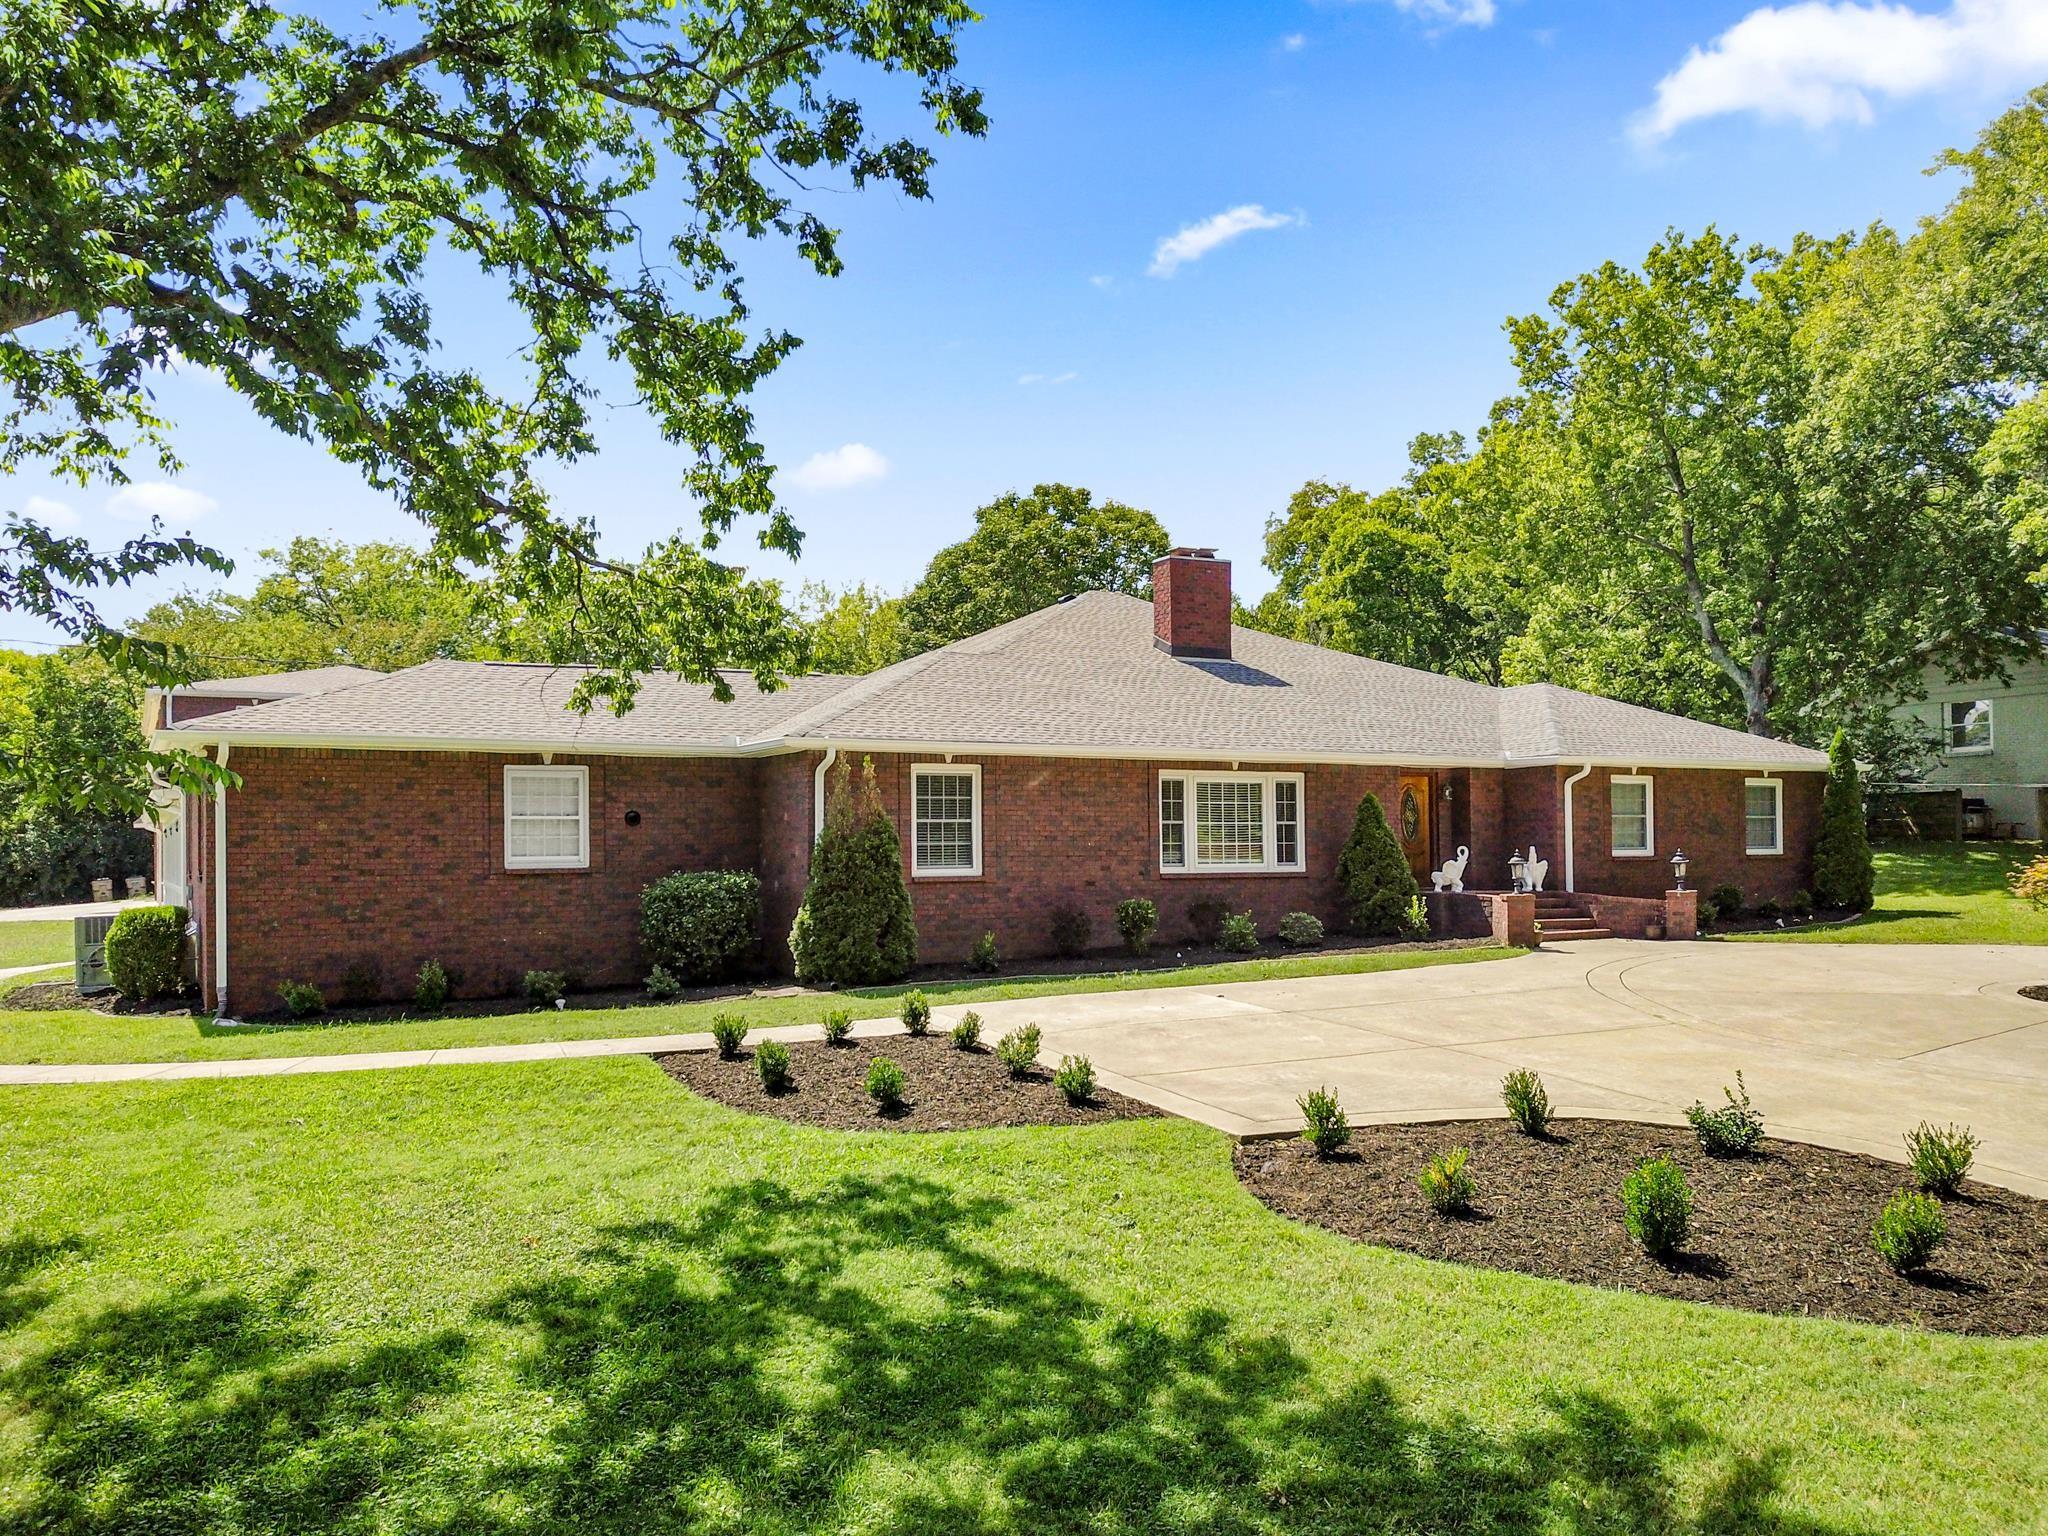 $1,699,900 - 8Br/7Ba -  for Sale in West Meade Farms, Nashville